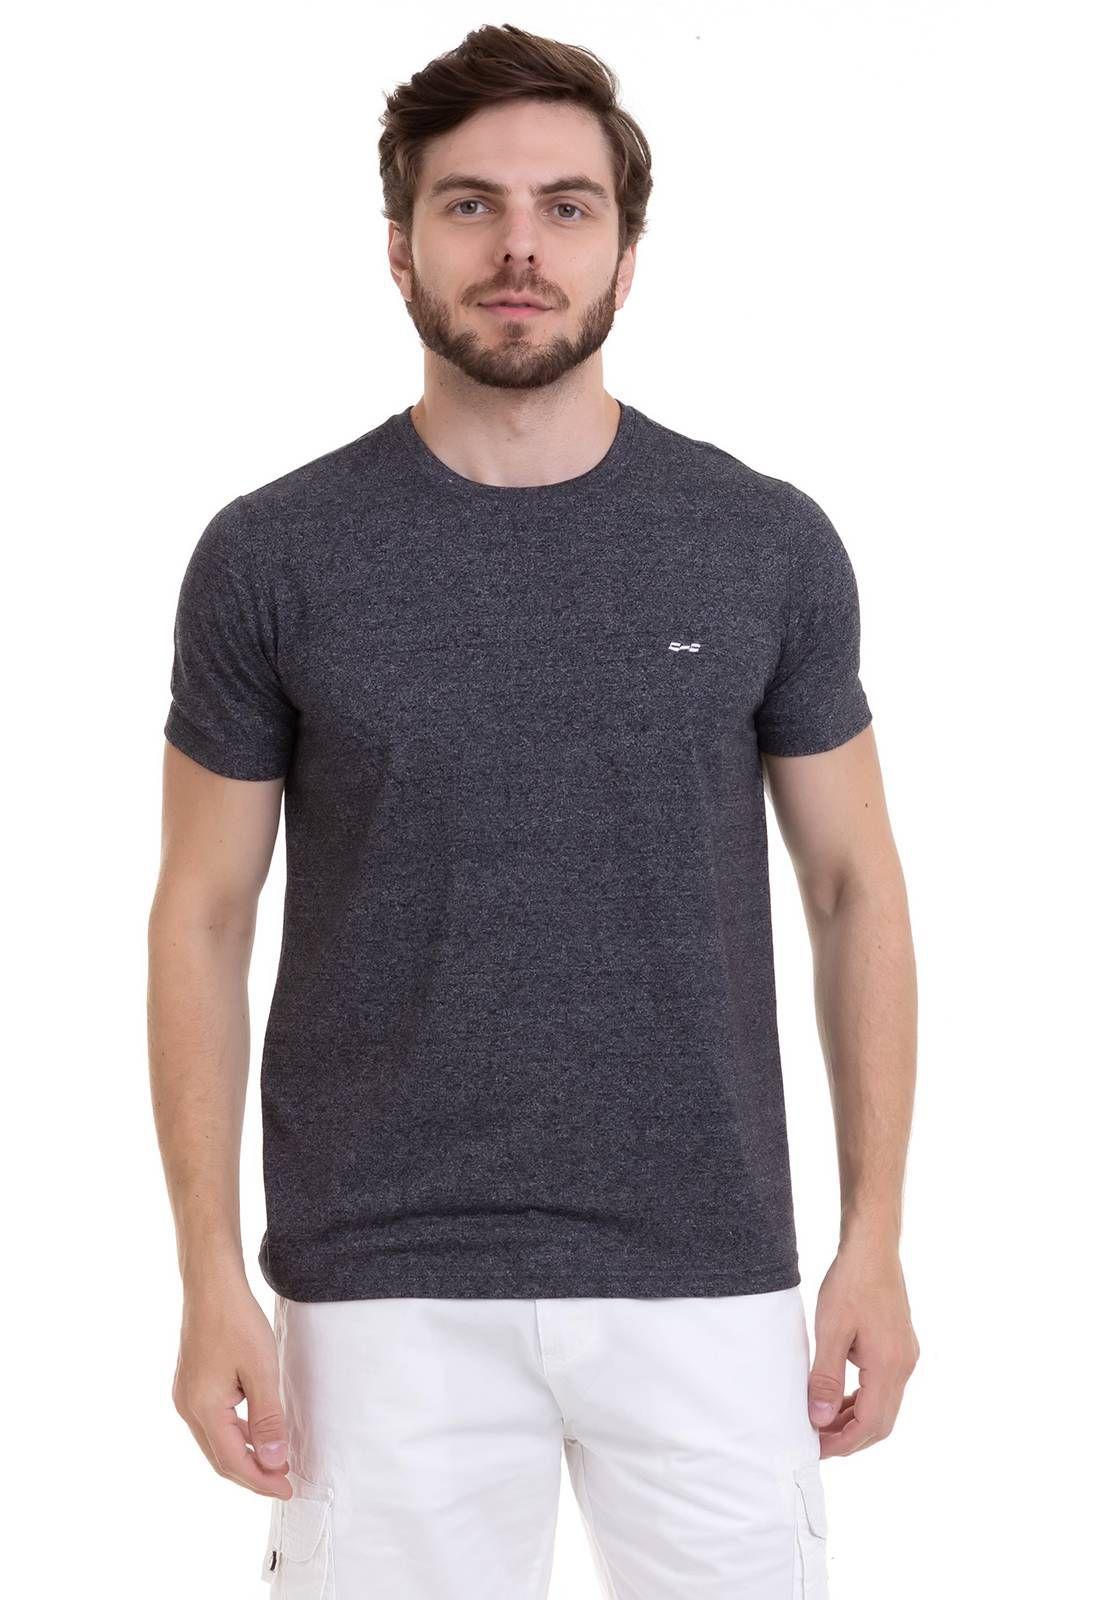 Camiseta Com Efeito Mescla Chumbo